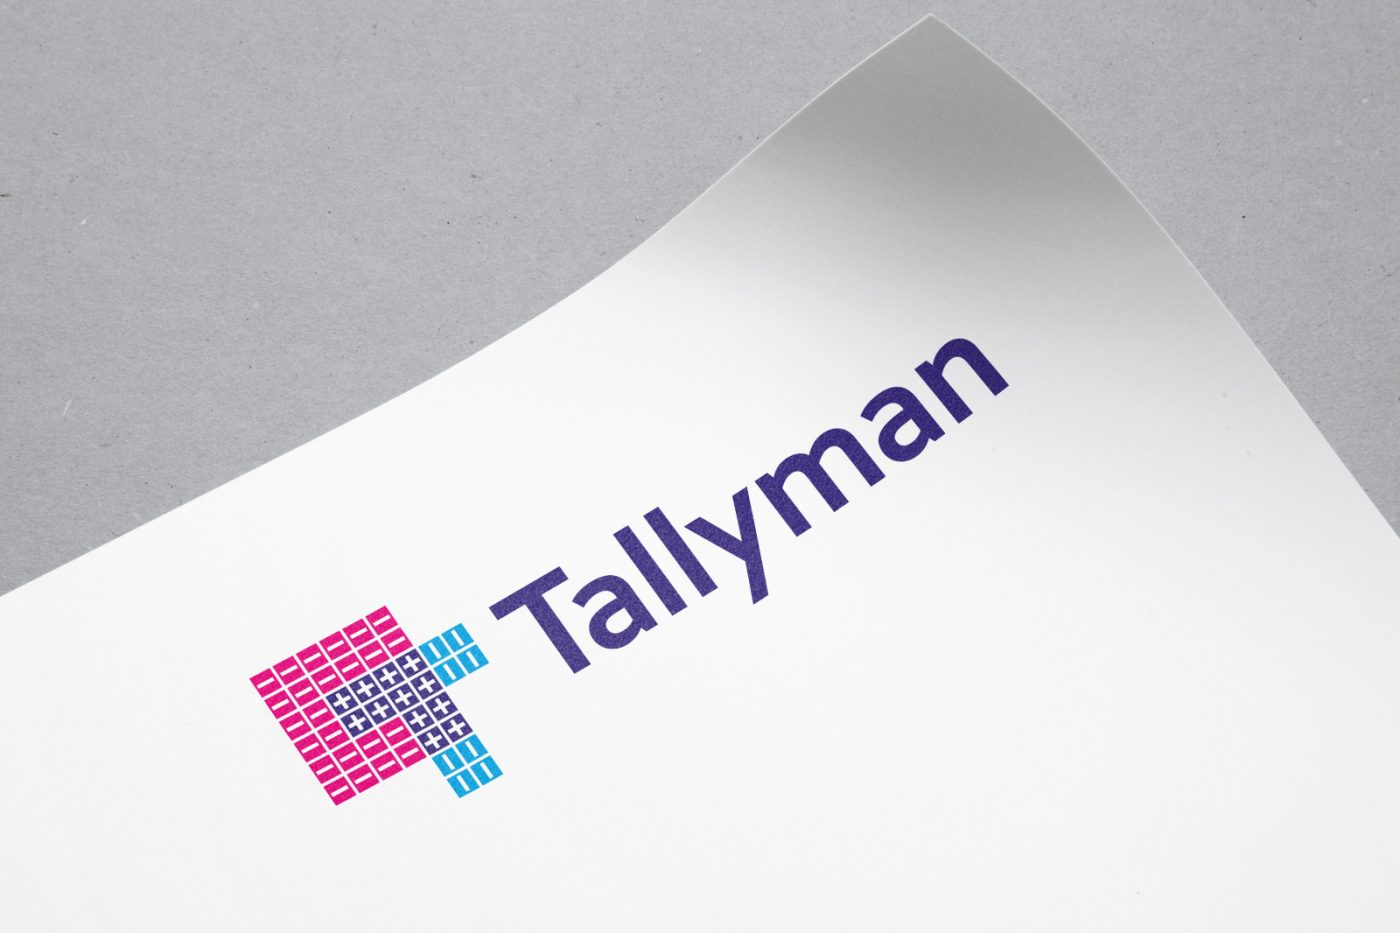 Tallyman